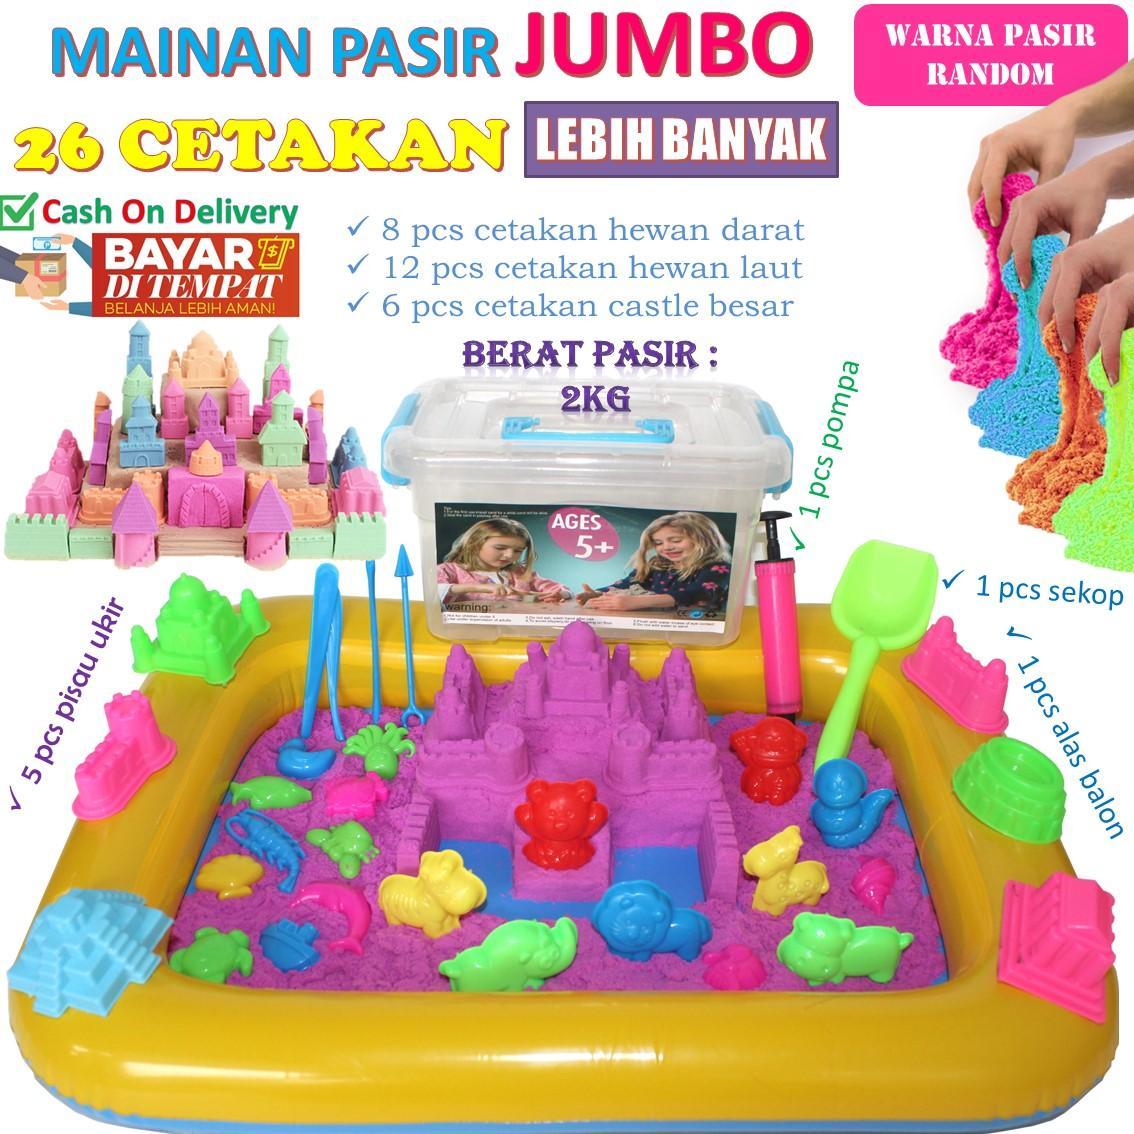 17275 barang ditemukan dalam Mainan Bentuk   Warna. Mainan Pasir Ajaib  Magic Sand Paket Lengkap 2Kg JUMBO 5982c5bc71